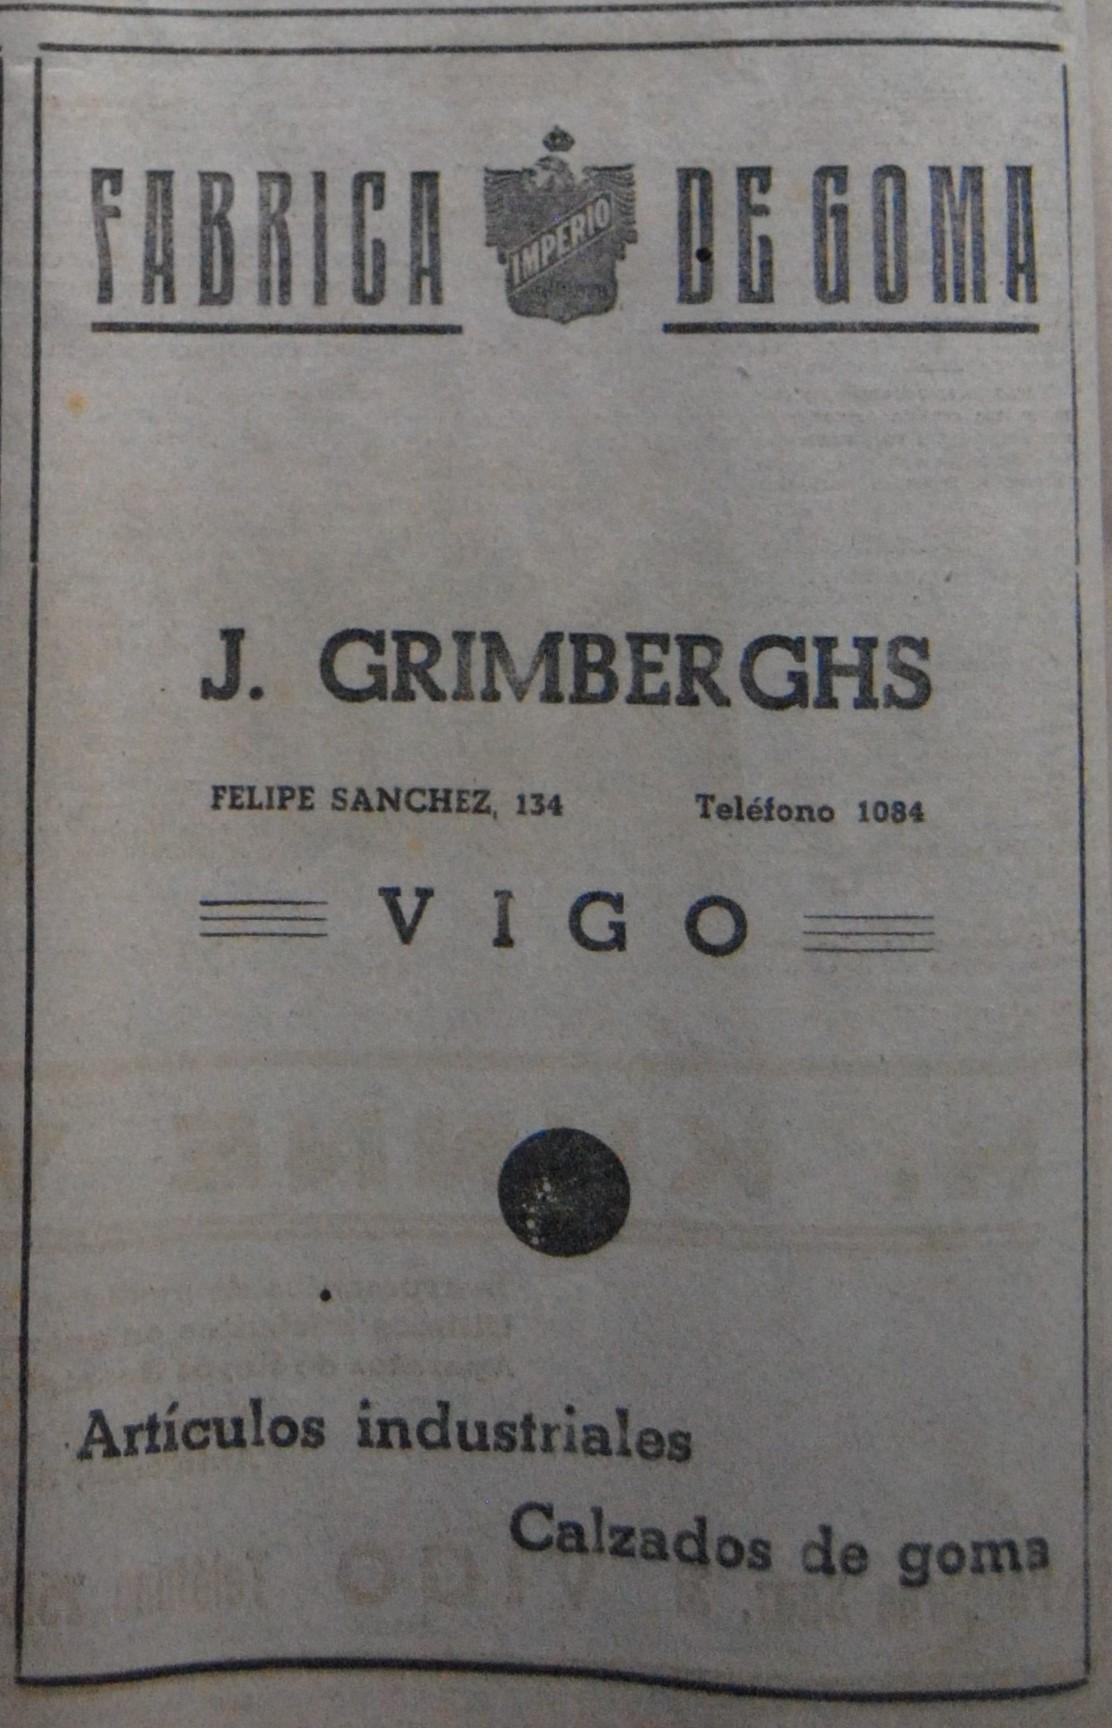 J. Grimberghs, fábrica de goma.